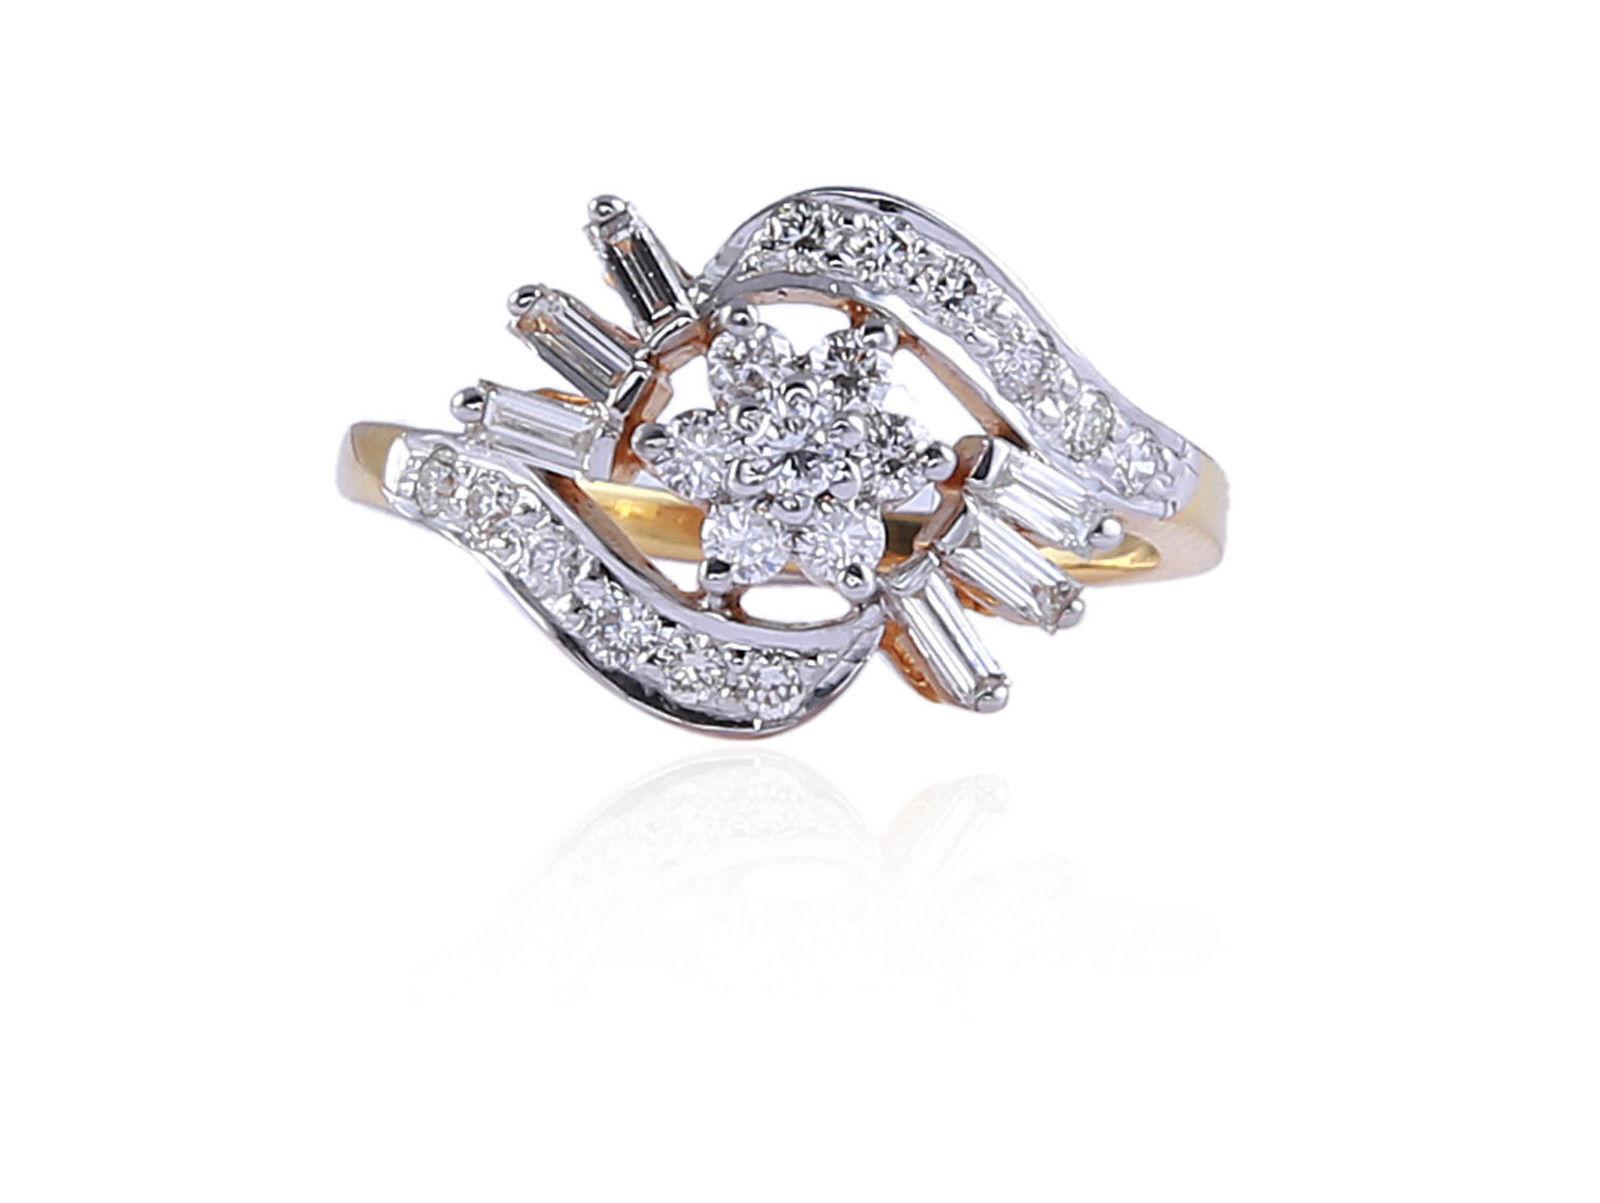 Pave 0.60 Cts Round Brilliant Cut Diamonds Ring In Fine Hallmark 18K Yellow gold